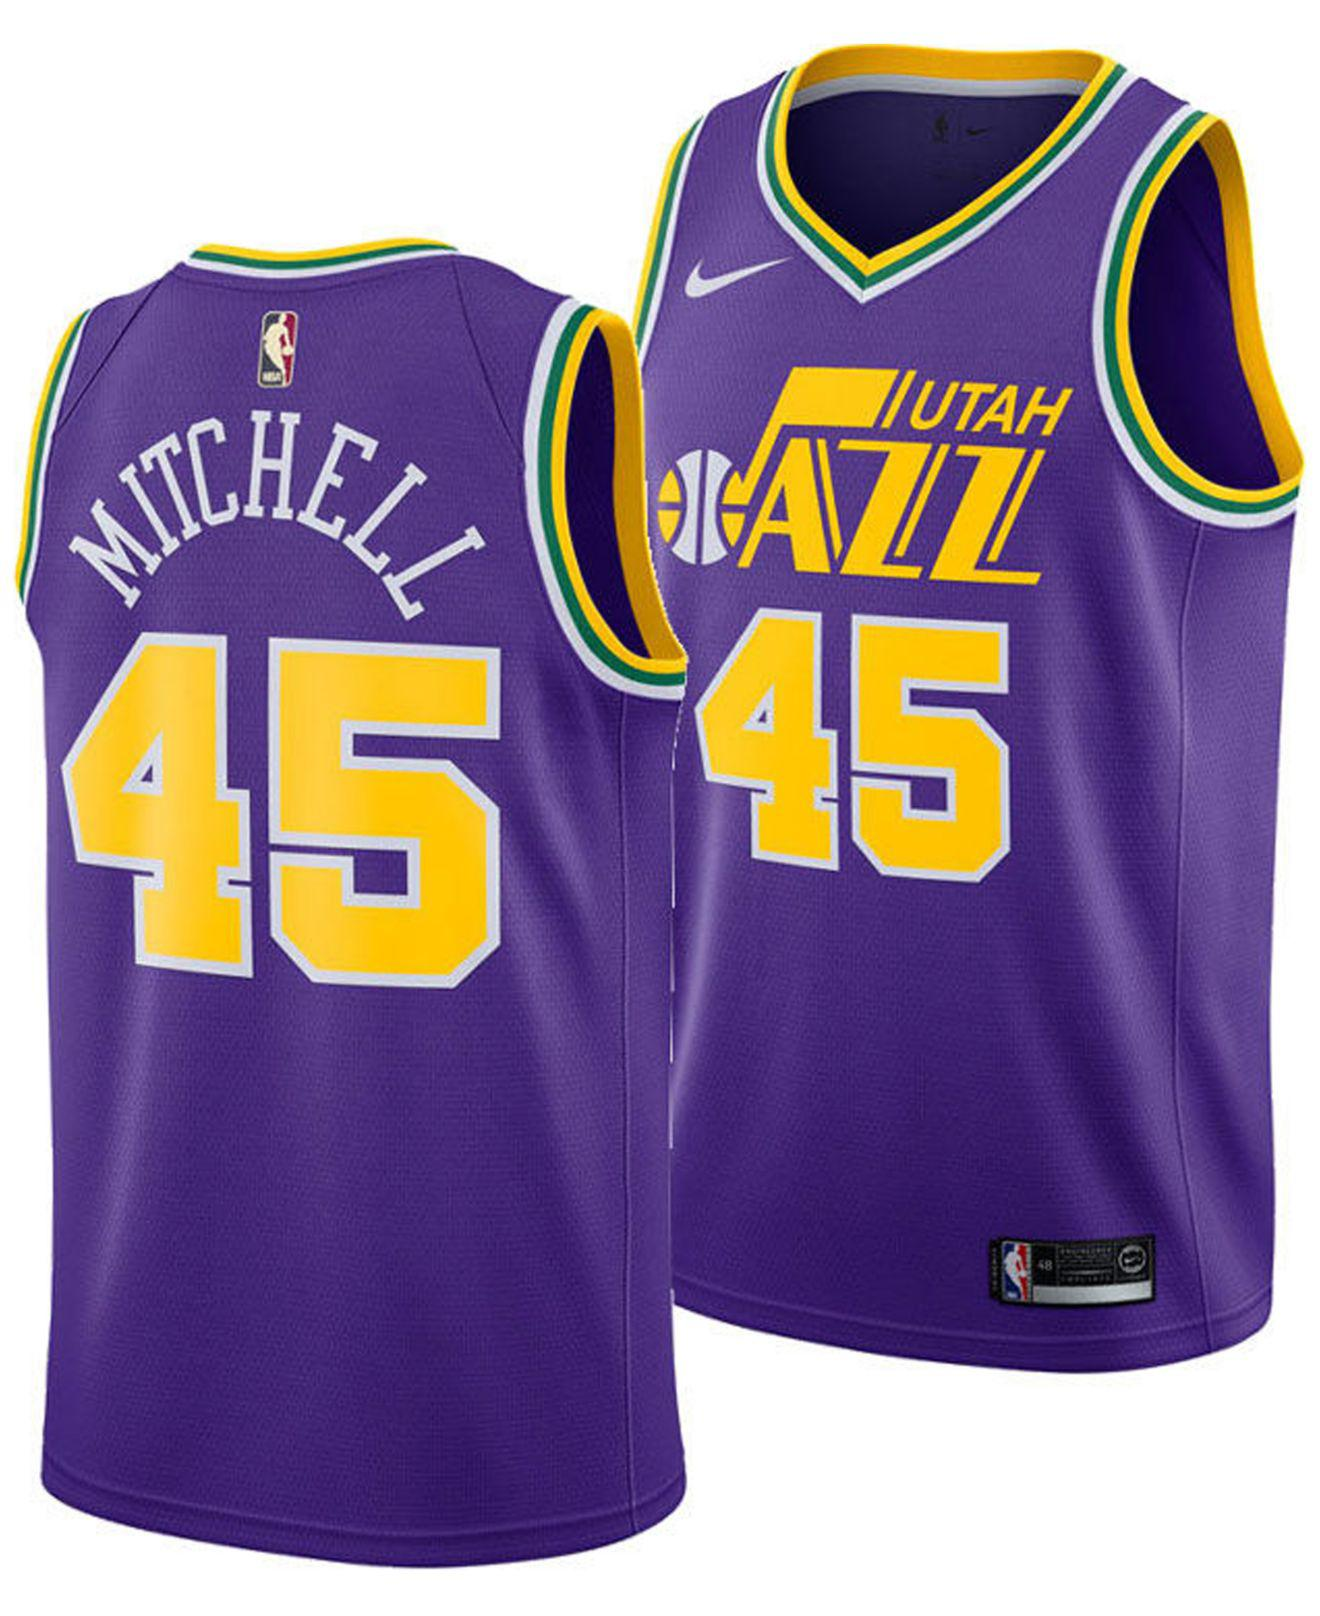 best website 9e7a9 d4097 Nike - Purple Donovan Mitchell Utah Jazz Hardwood Classic Swingman Jersey  for Men - Lyst. View fullscreen